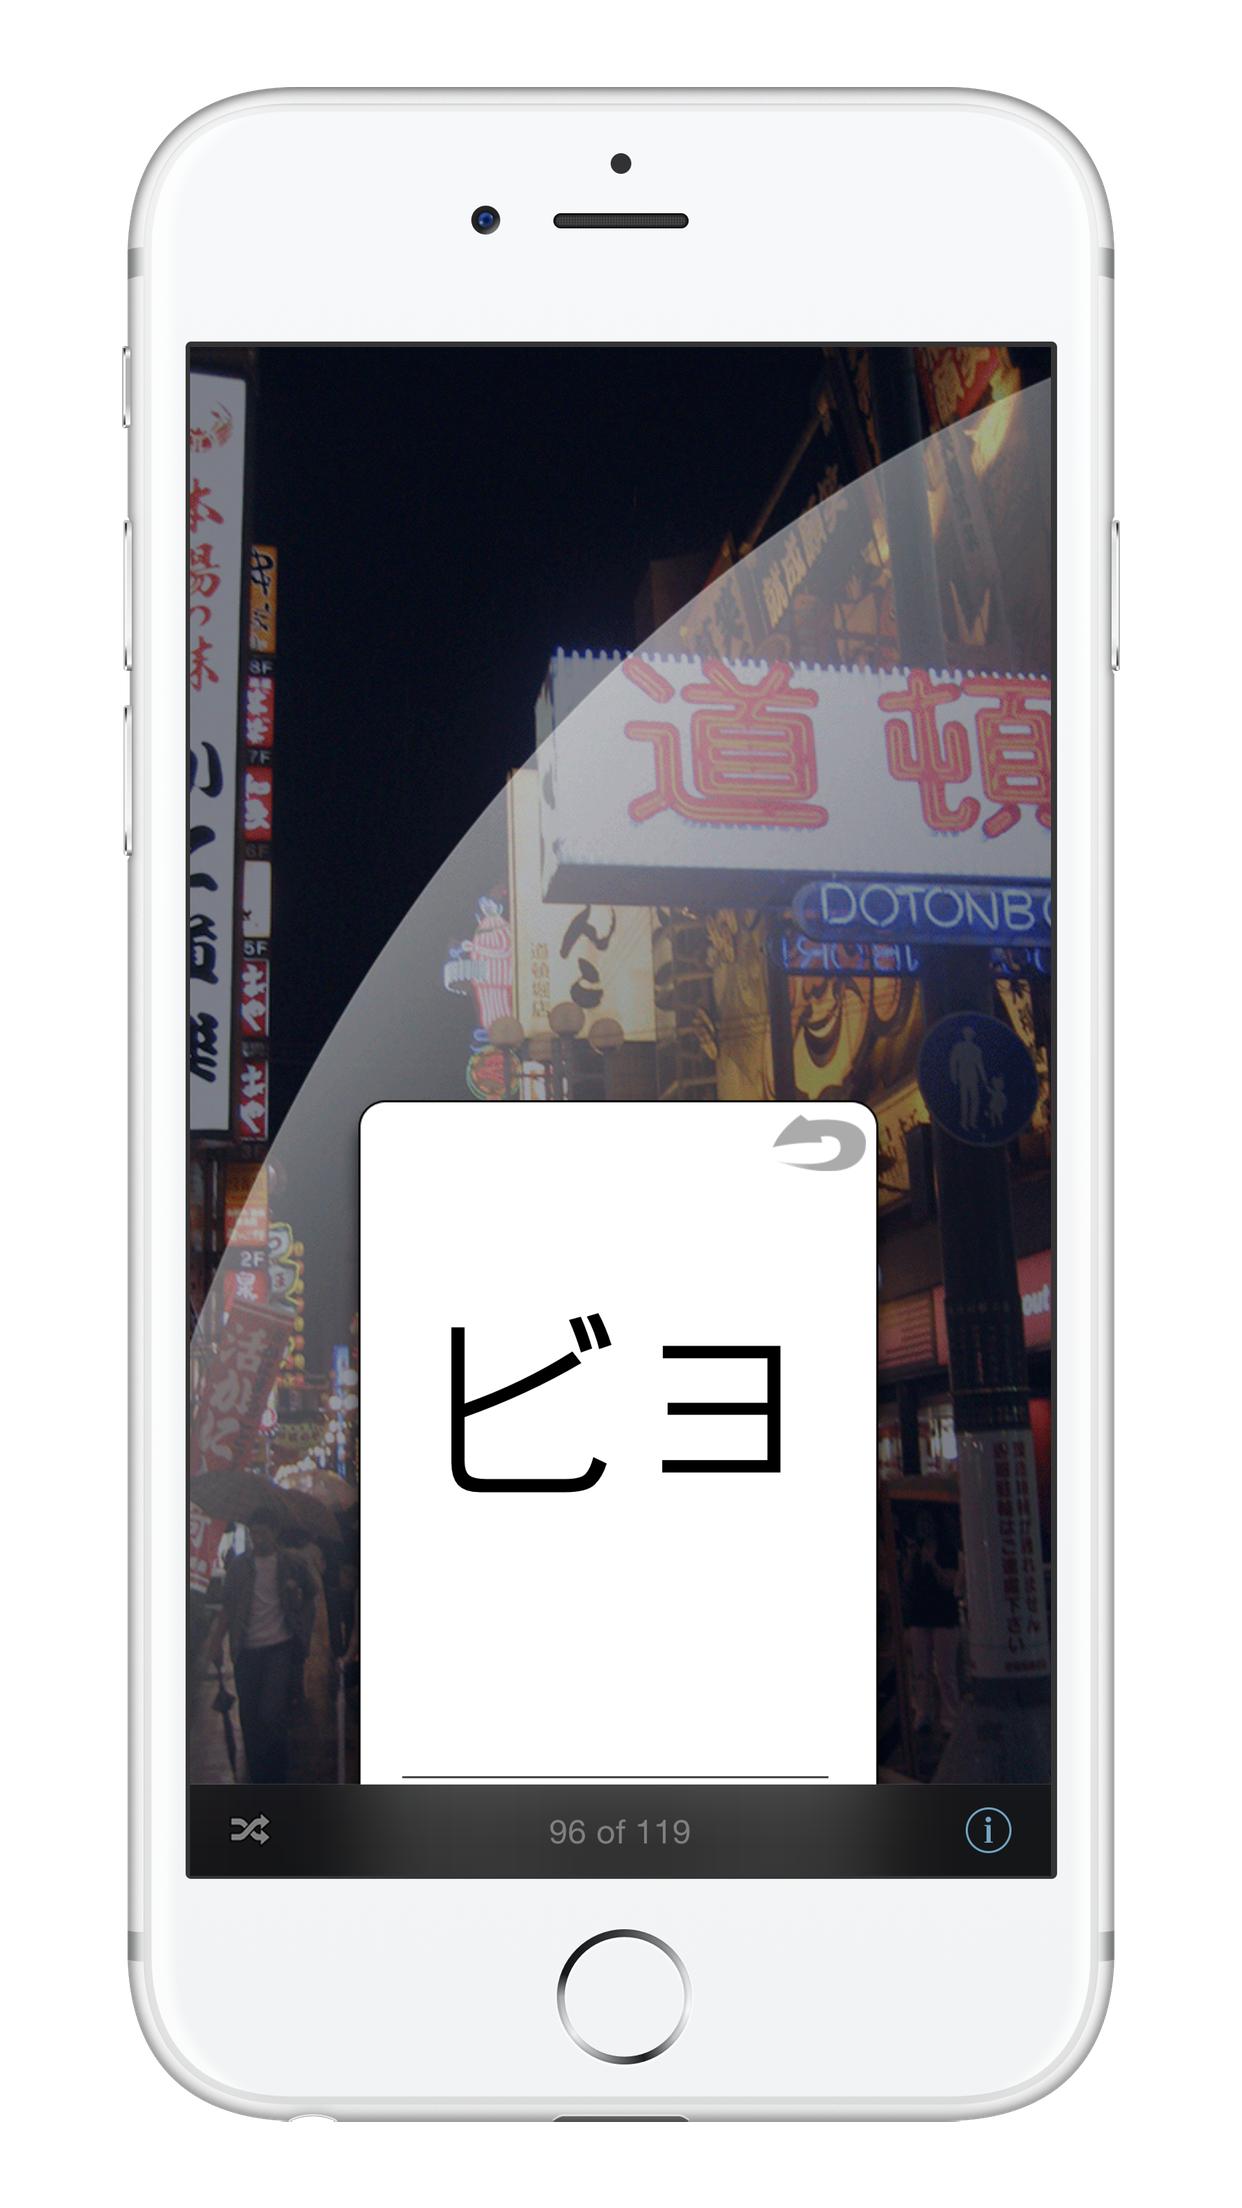 Katakana screenshot 4.png